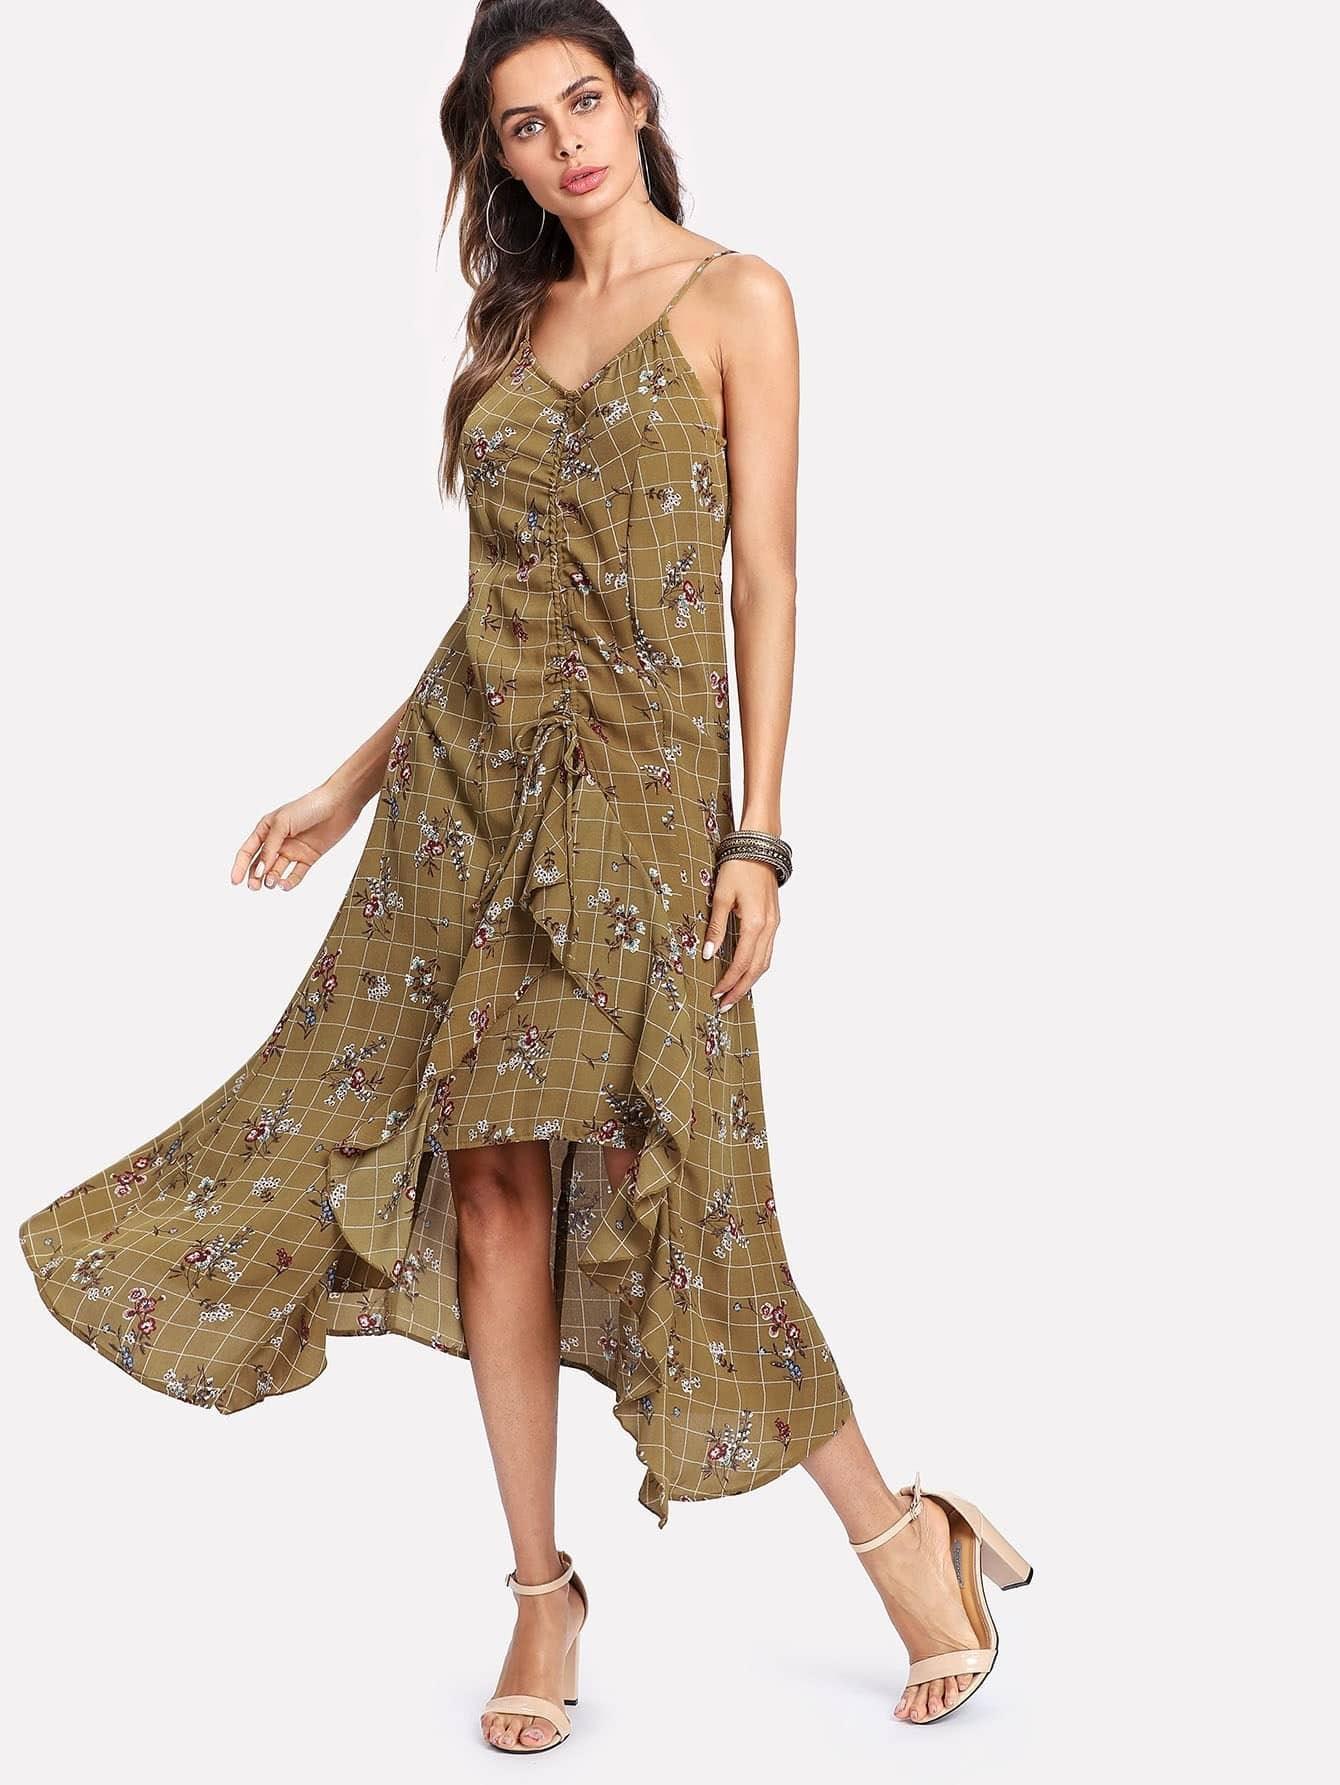 Shirred Front Ruffle Trim Mixed Print Cami Dress монитор 27 nec pa272w sv2